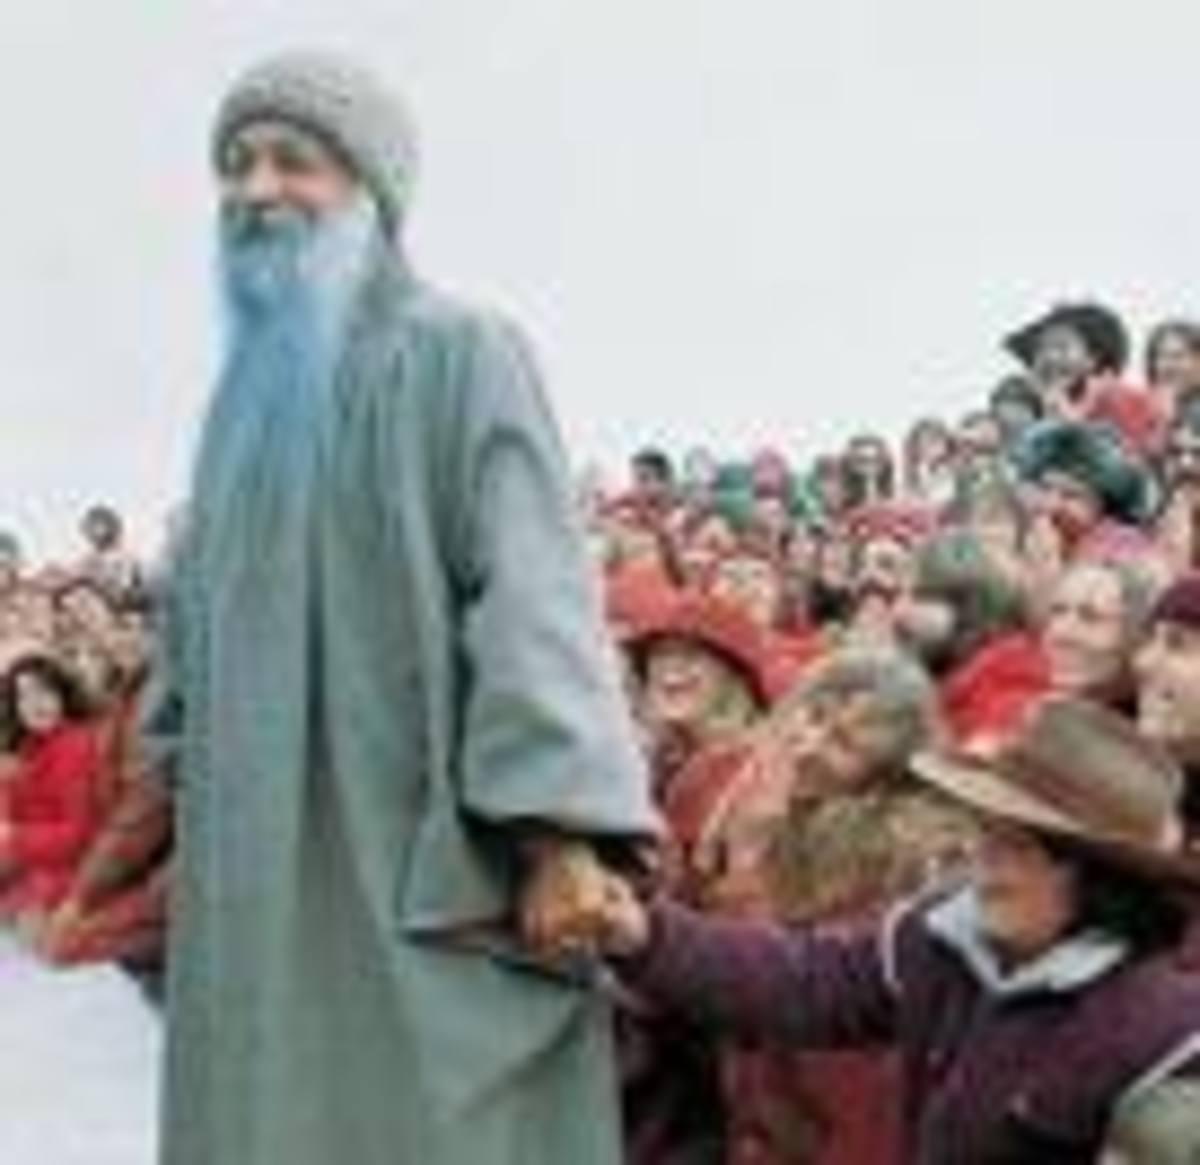 Millions of OSHO devotees